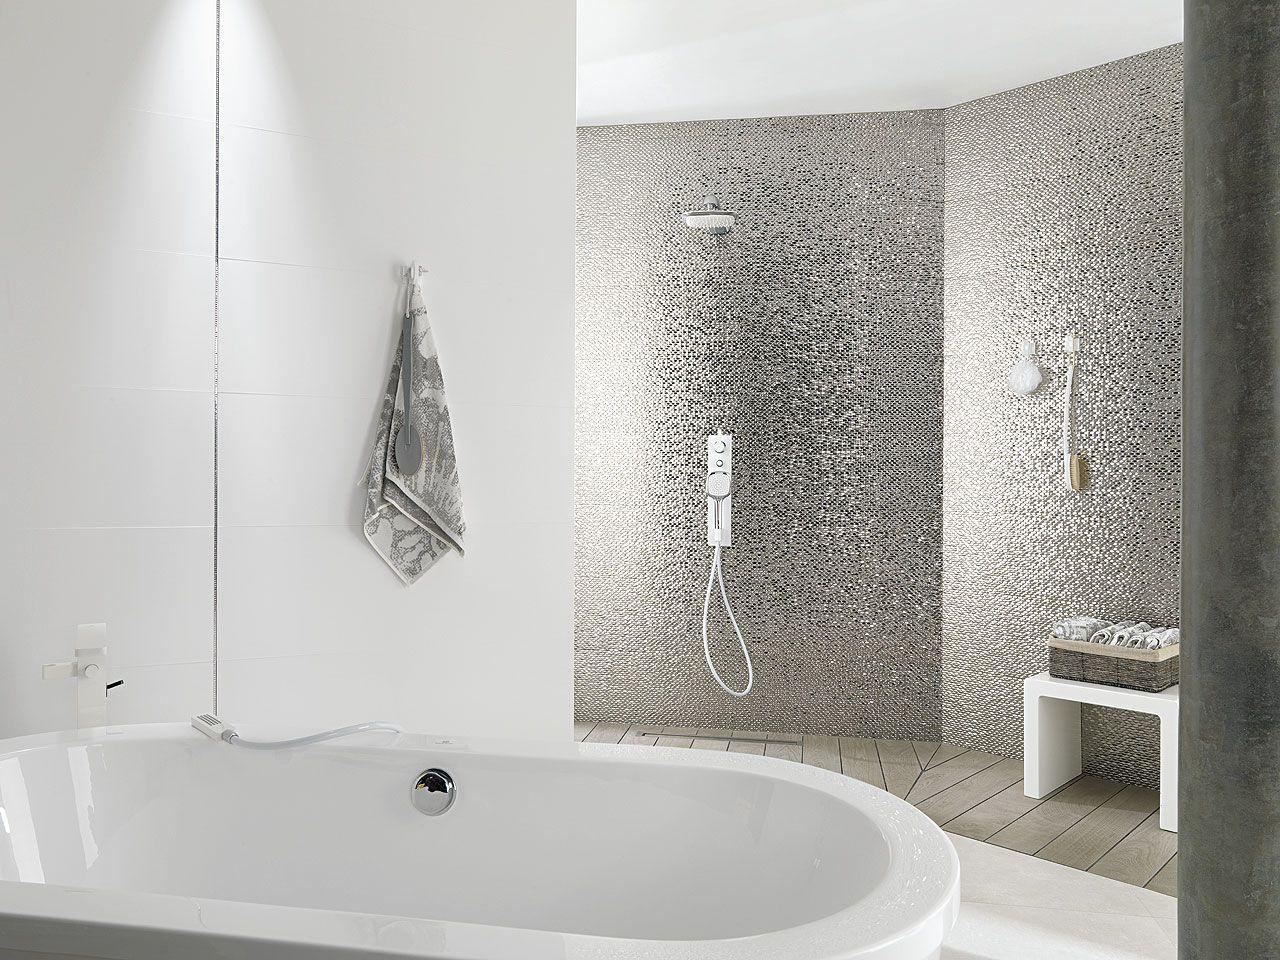 Bathroom Tiles Porcelanosa 81 best porcelanosa images on pinterest | bathroom ideas, tile